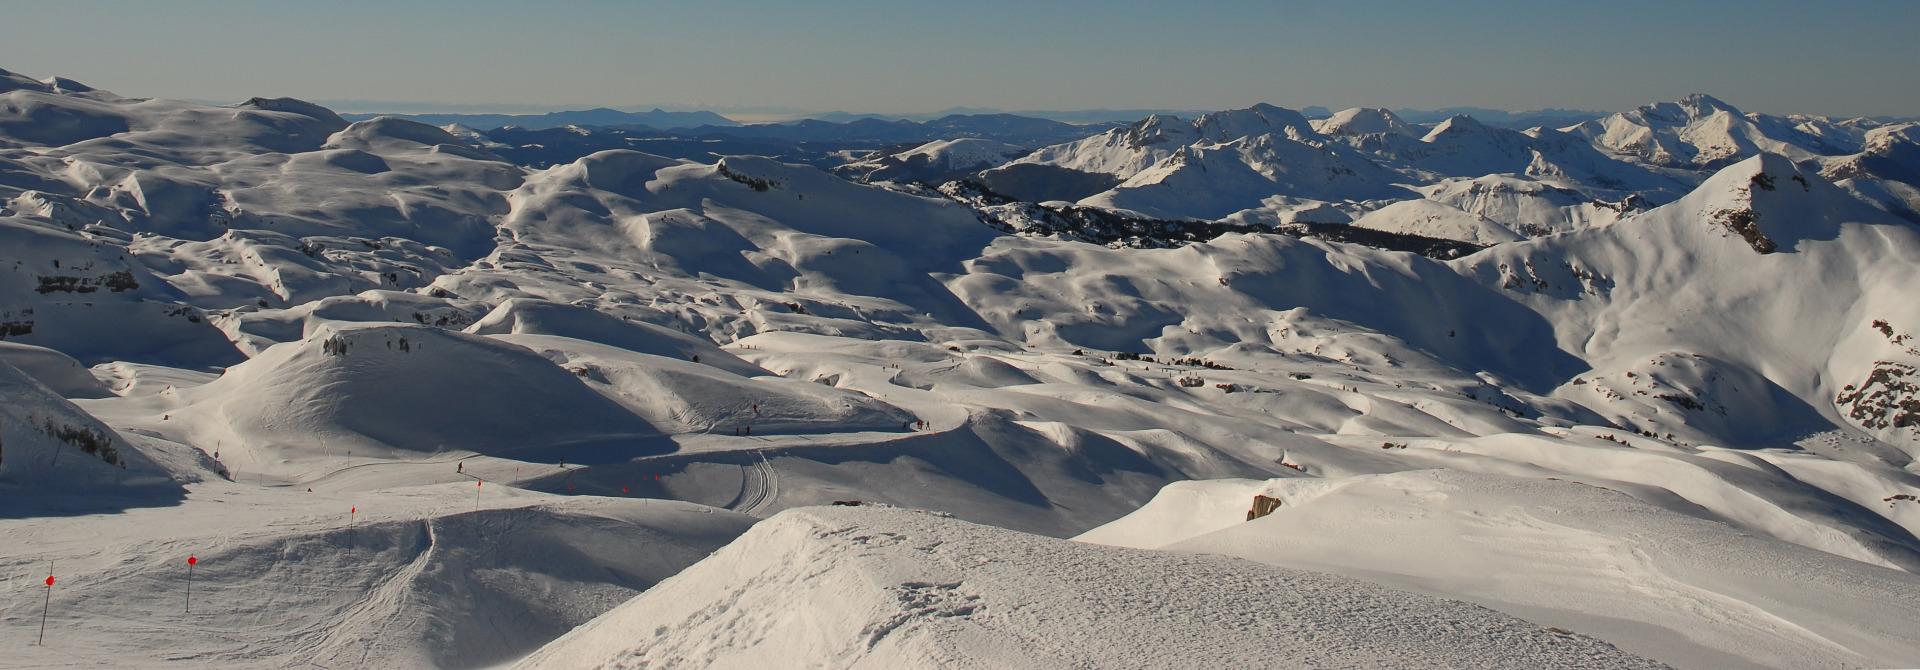 La Pierre St. Martin. N'PY Nuevos Pirineos - ©N'PY Nuevos Pirineos